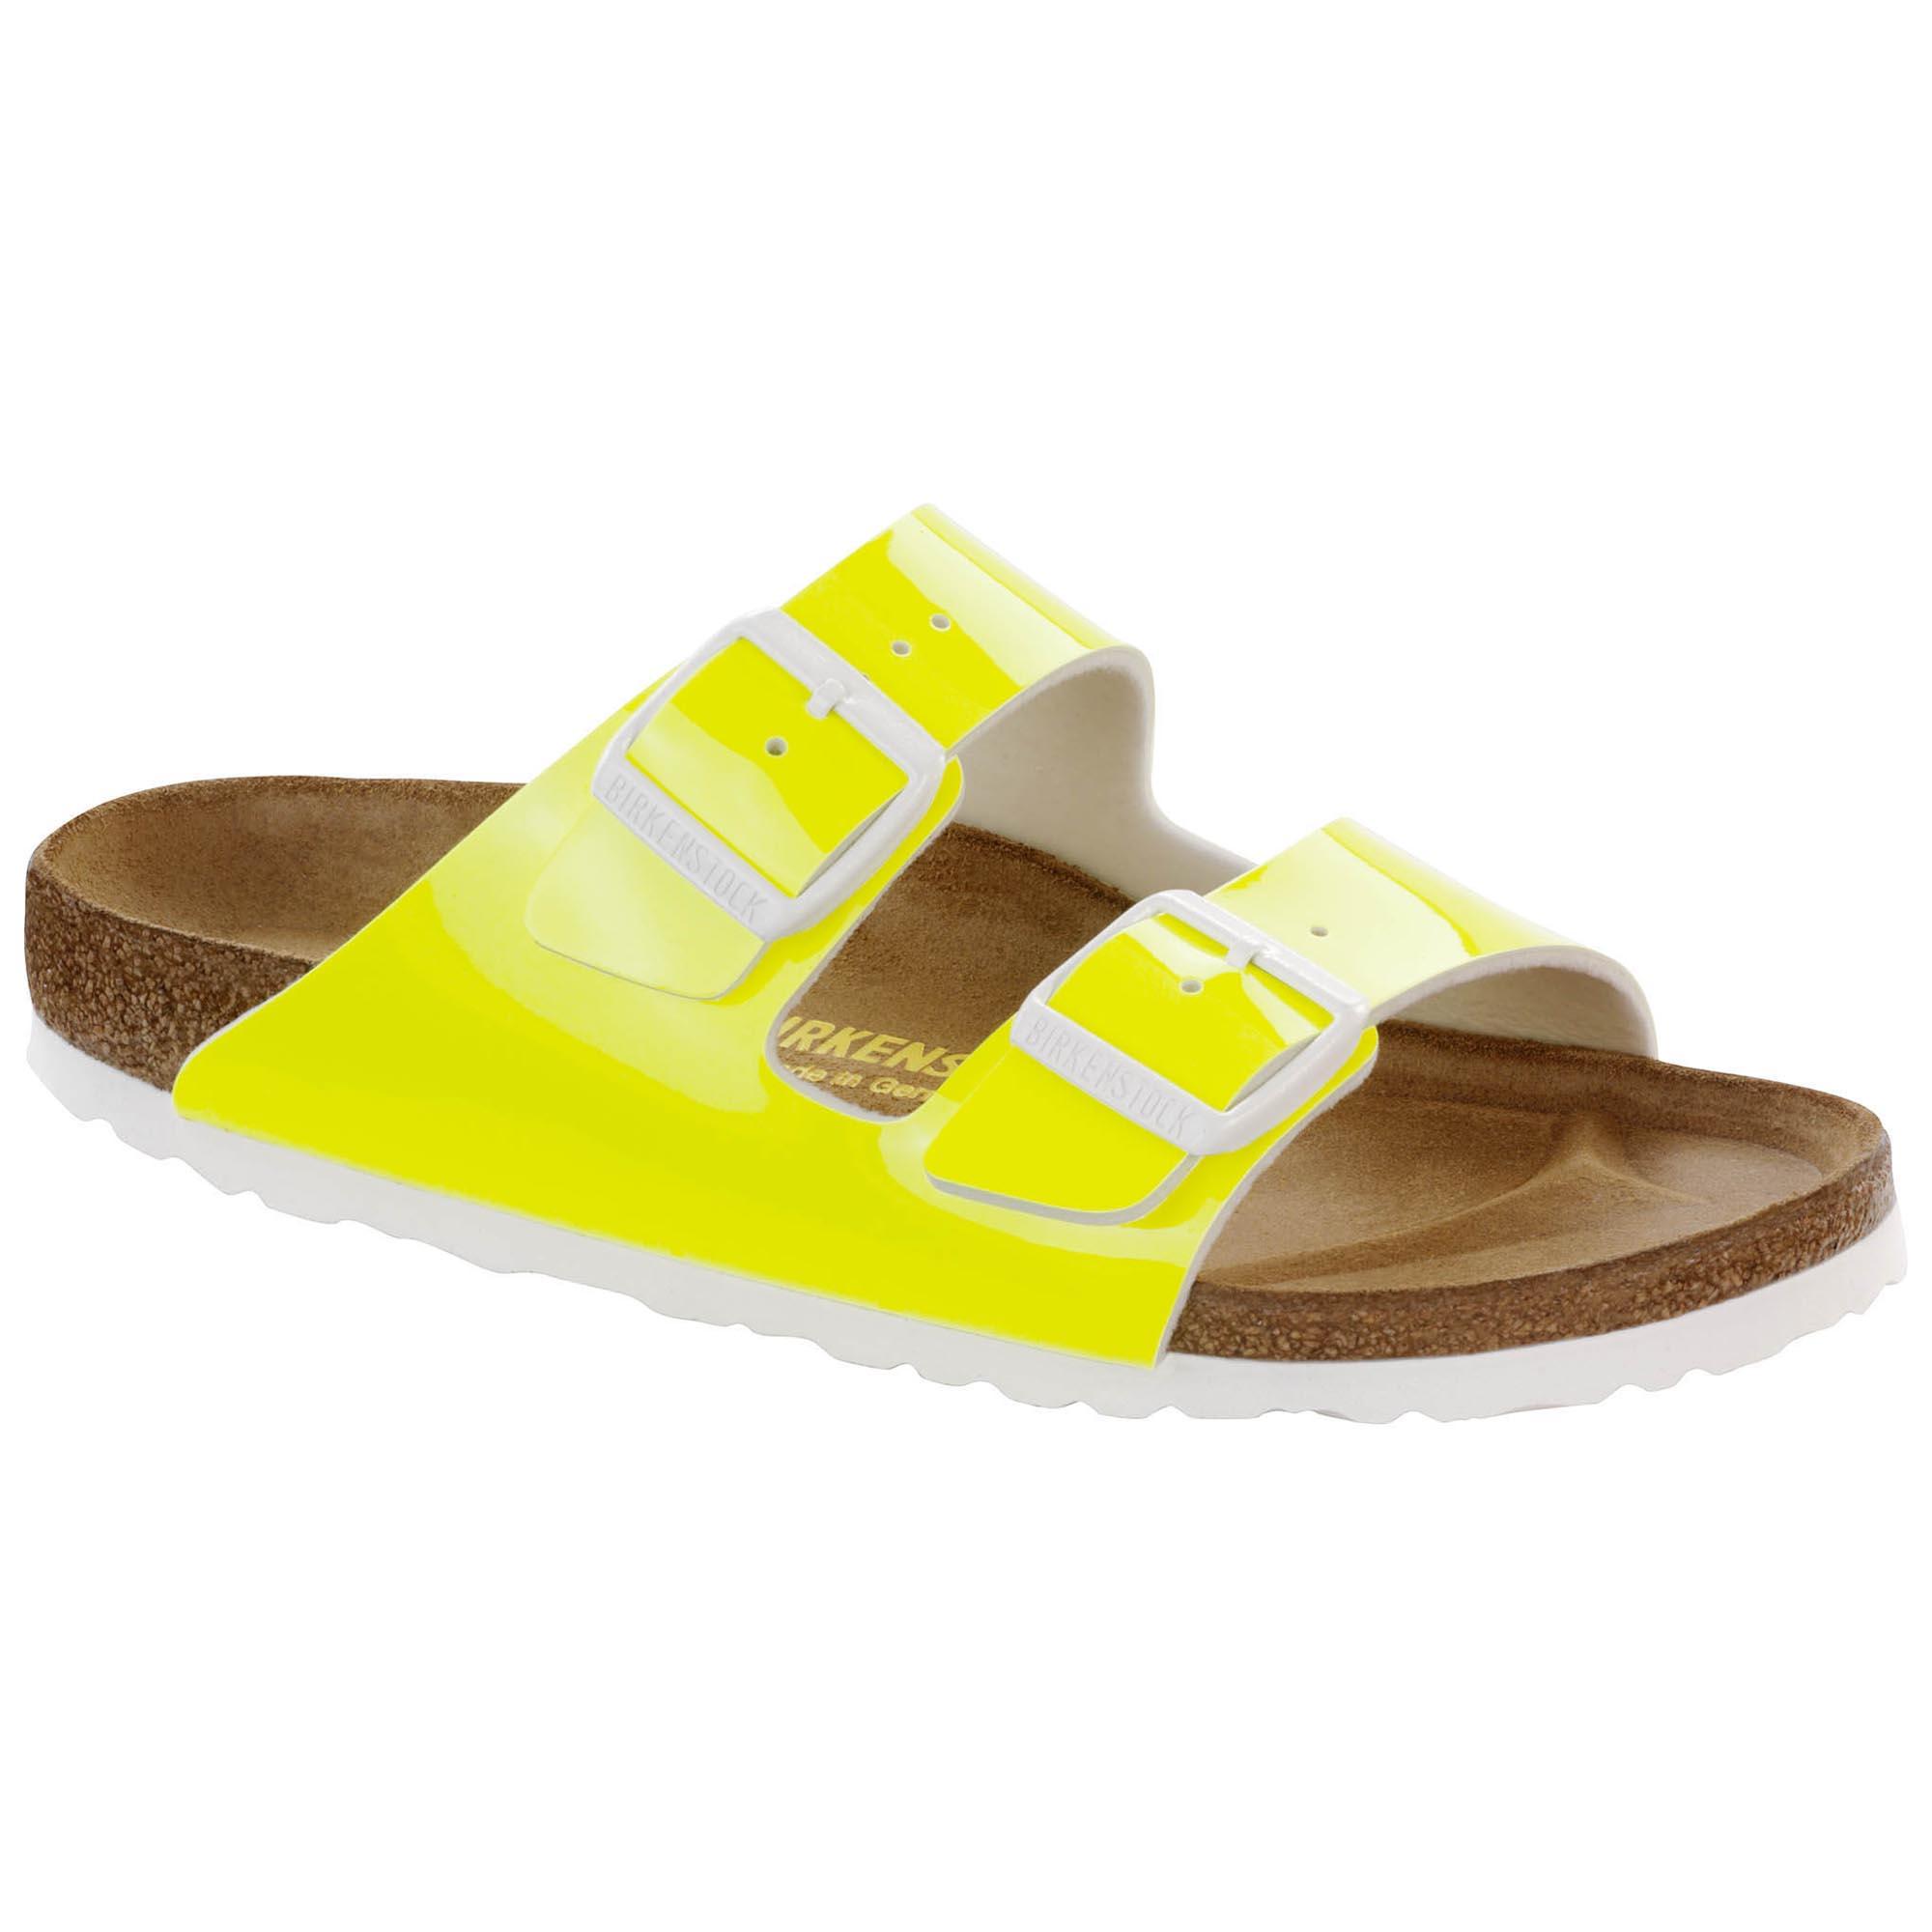 96641ef2c2c5 Arizona Birko-Flor Patent Neon Yellow Patent